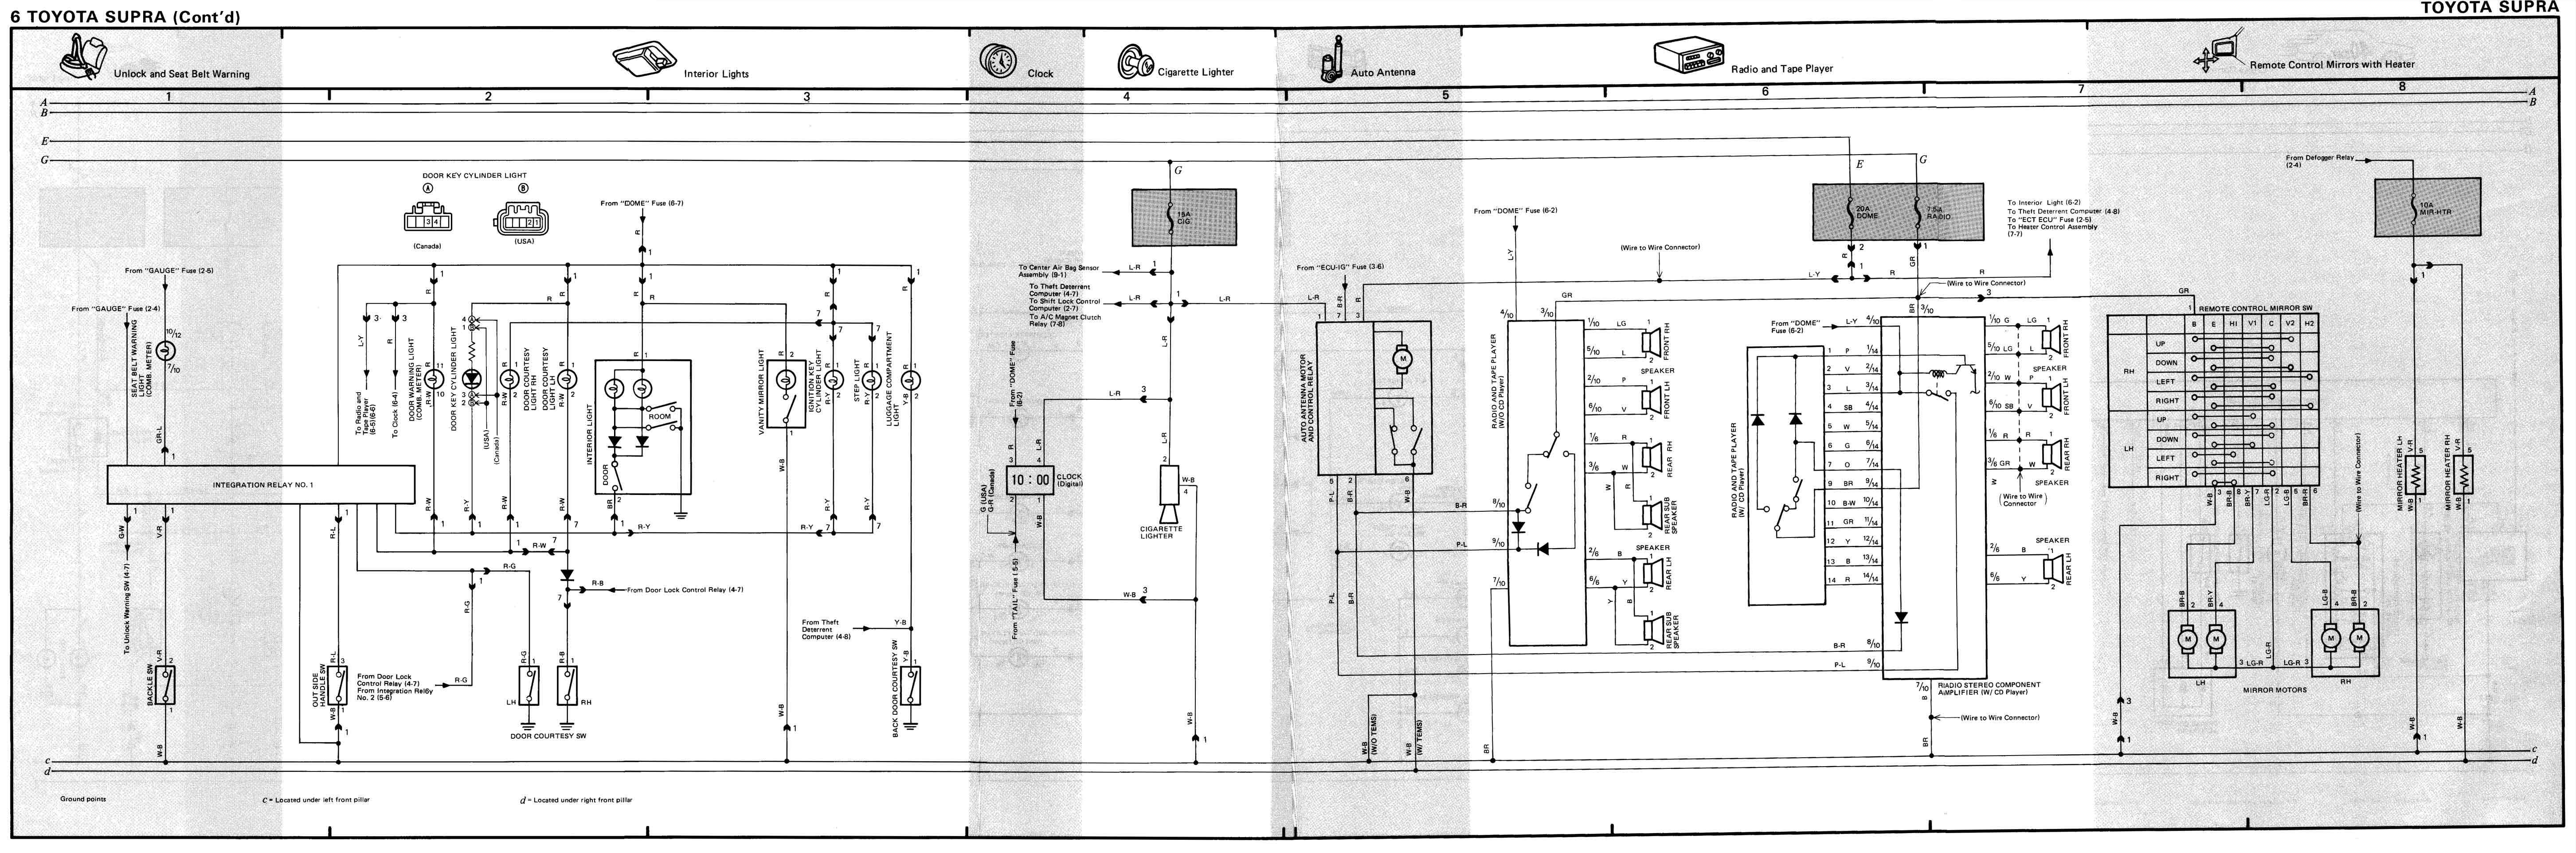 1990 toyota Camry Wiring Diagram 1987 toyota Wiring Diagram Trusted Wiring Diagram Of 1990 toyota Camry Wiring Diagram